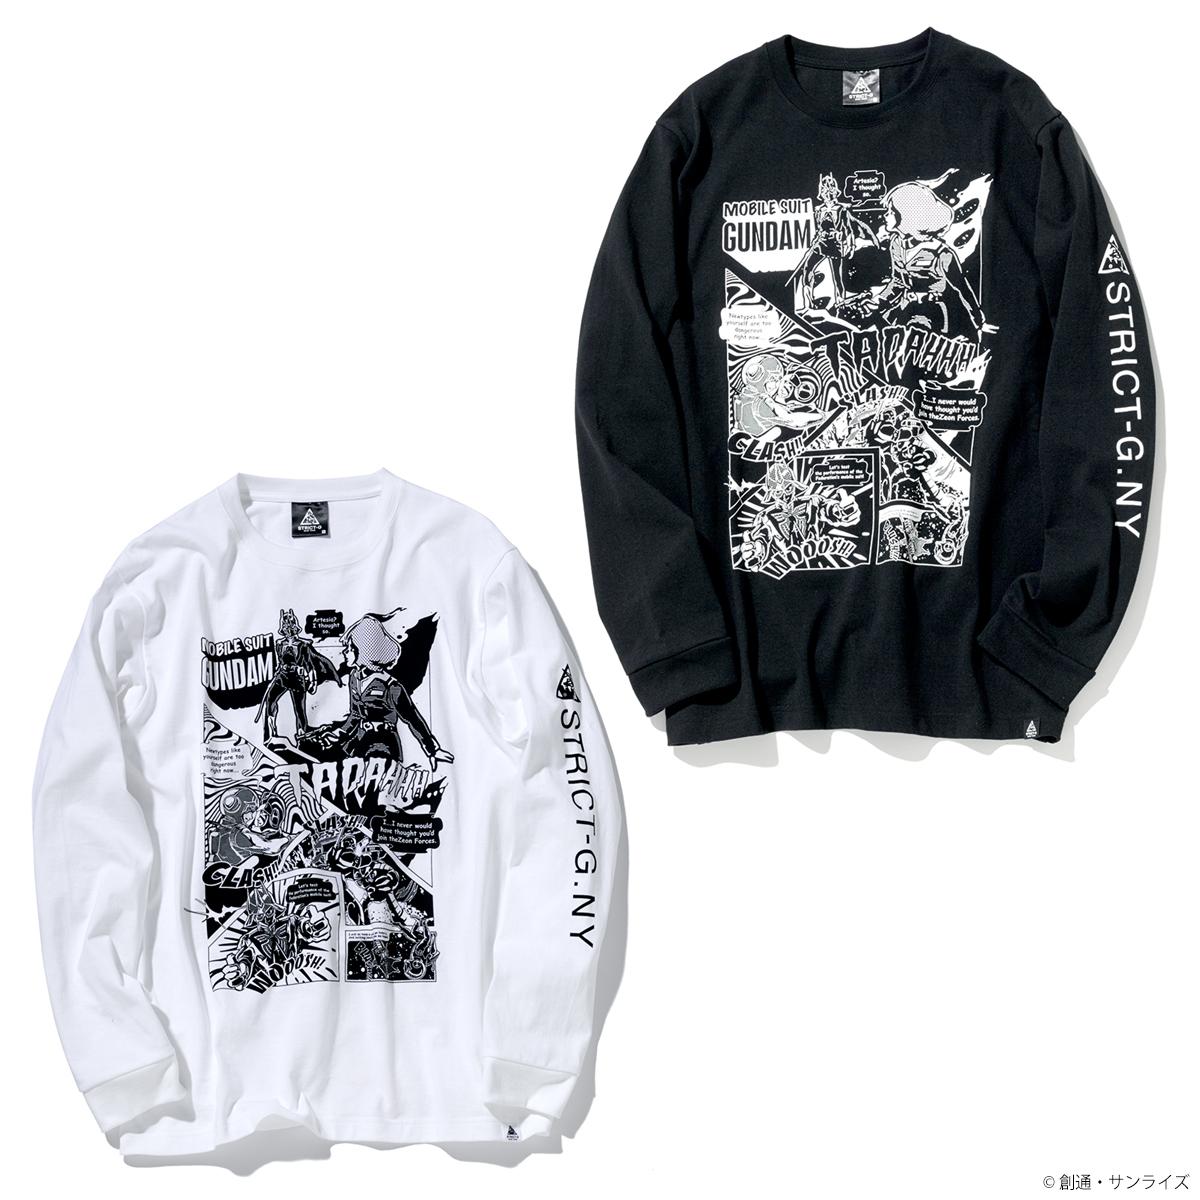 STRICT-G NEW YARK 長袖Tシャツ コミック柄